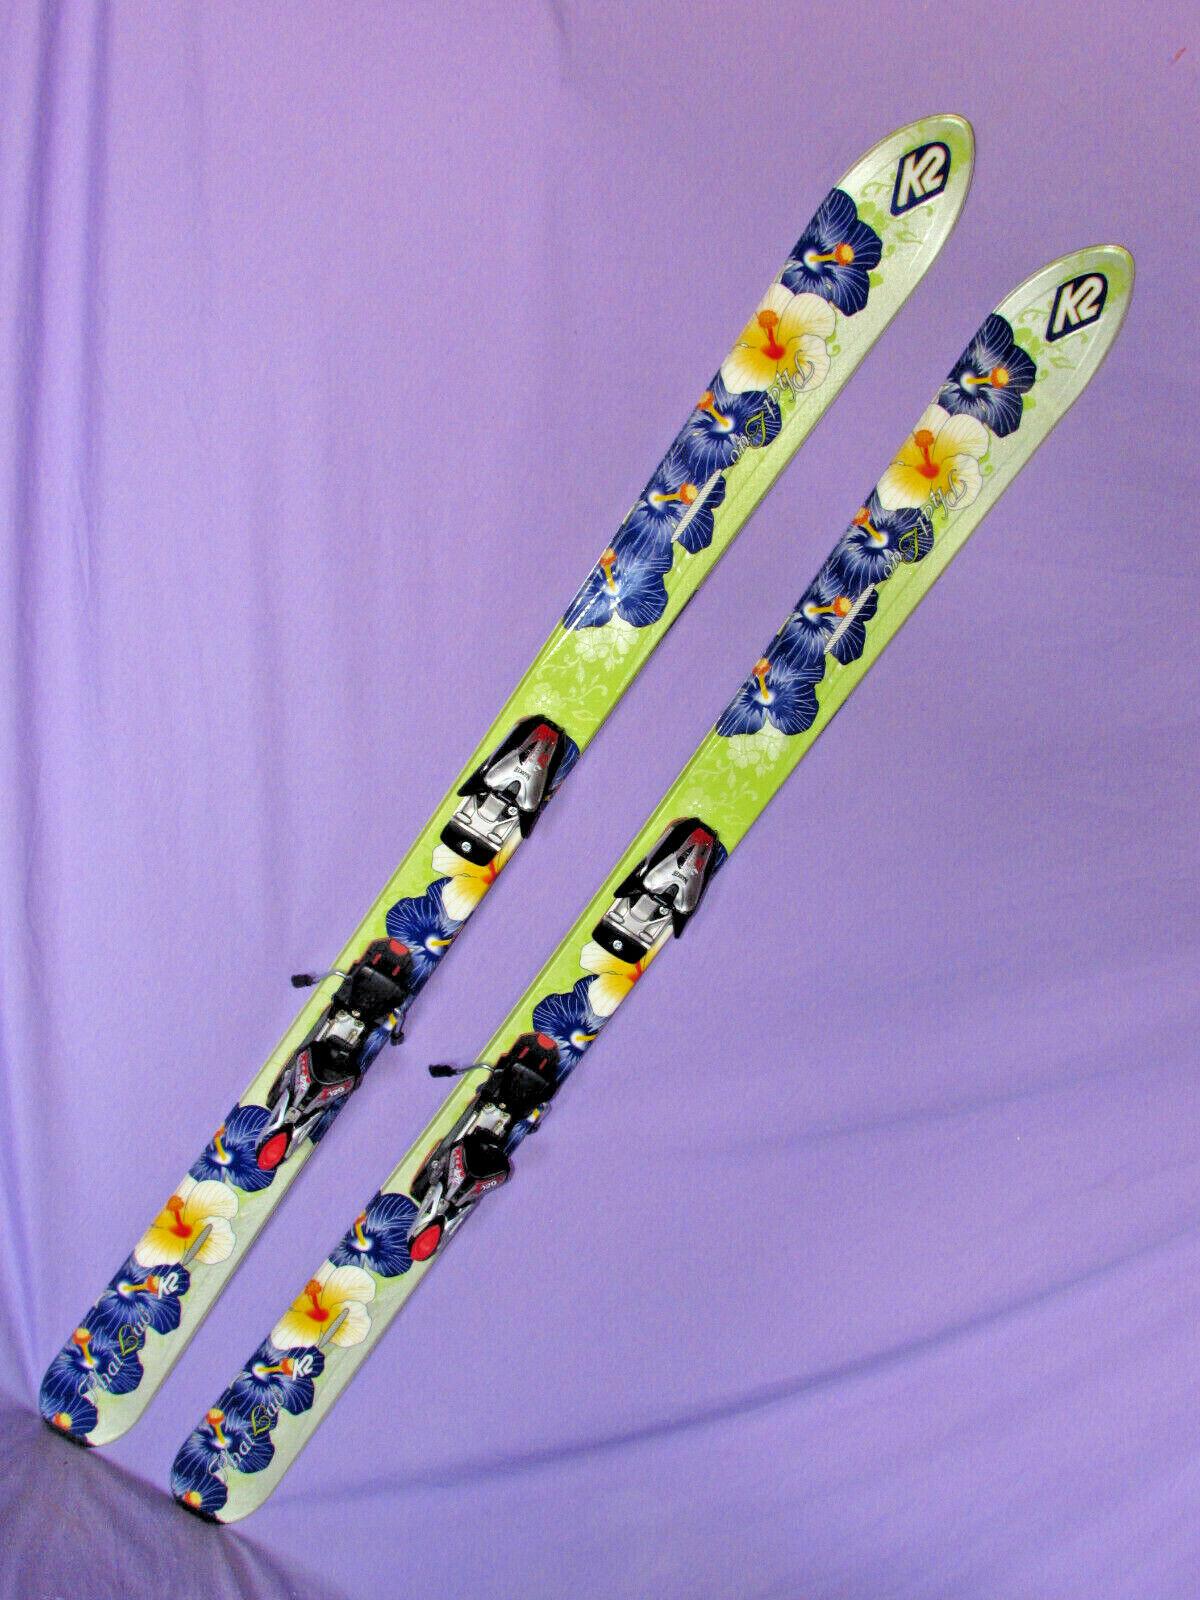 K2 Phat Luv T Nine  womens POWDER skis 160cm with Marker 12.0 FREE ski bindings   buy cheap new